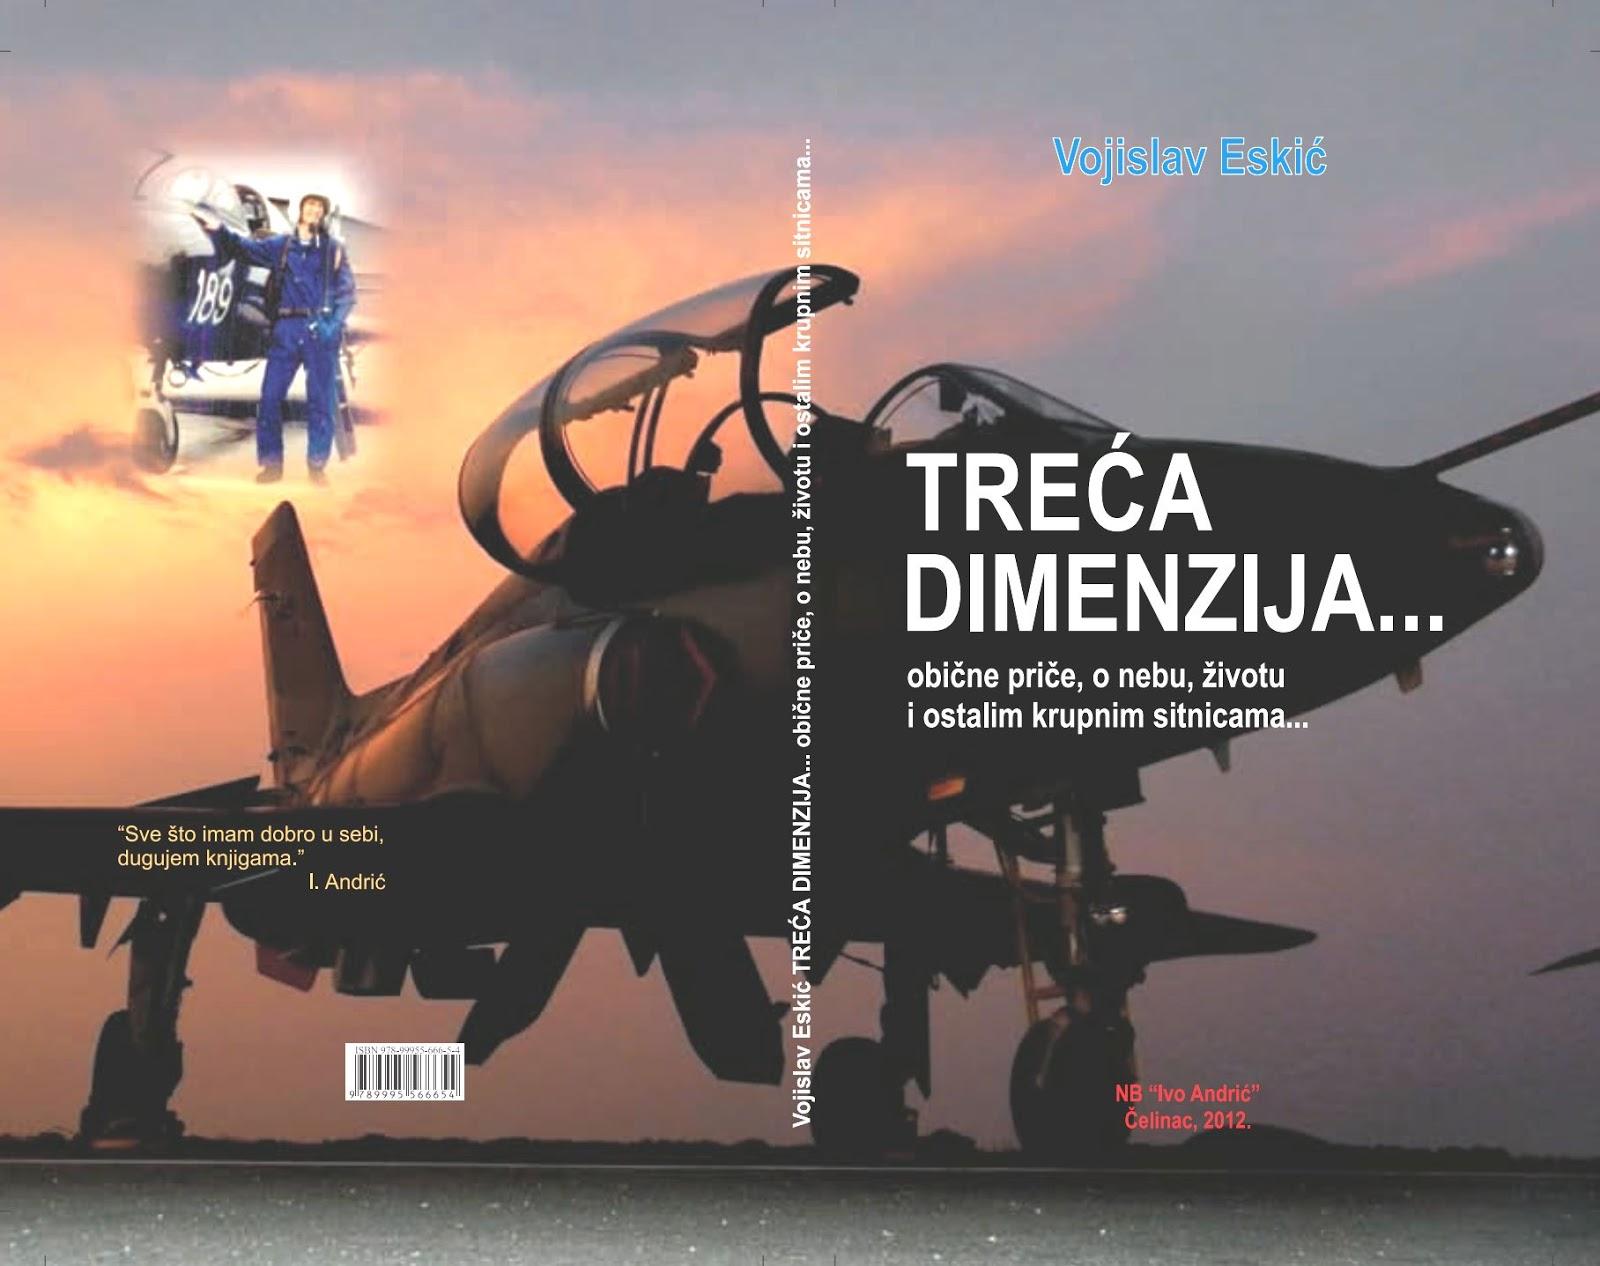 Nova knjiga Vojislava Eskića TREČA DIMENZIJA  00d4b8a2a78216e8ba9553dc40748f85f3fbee3b